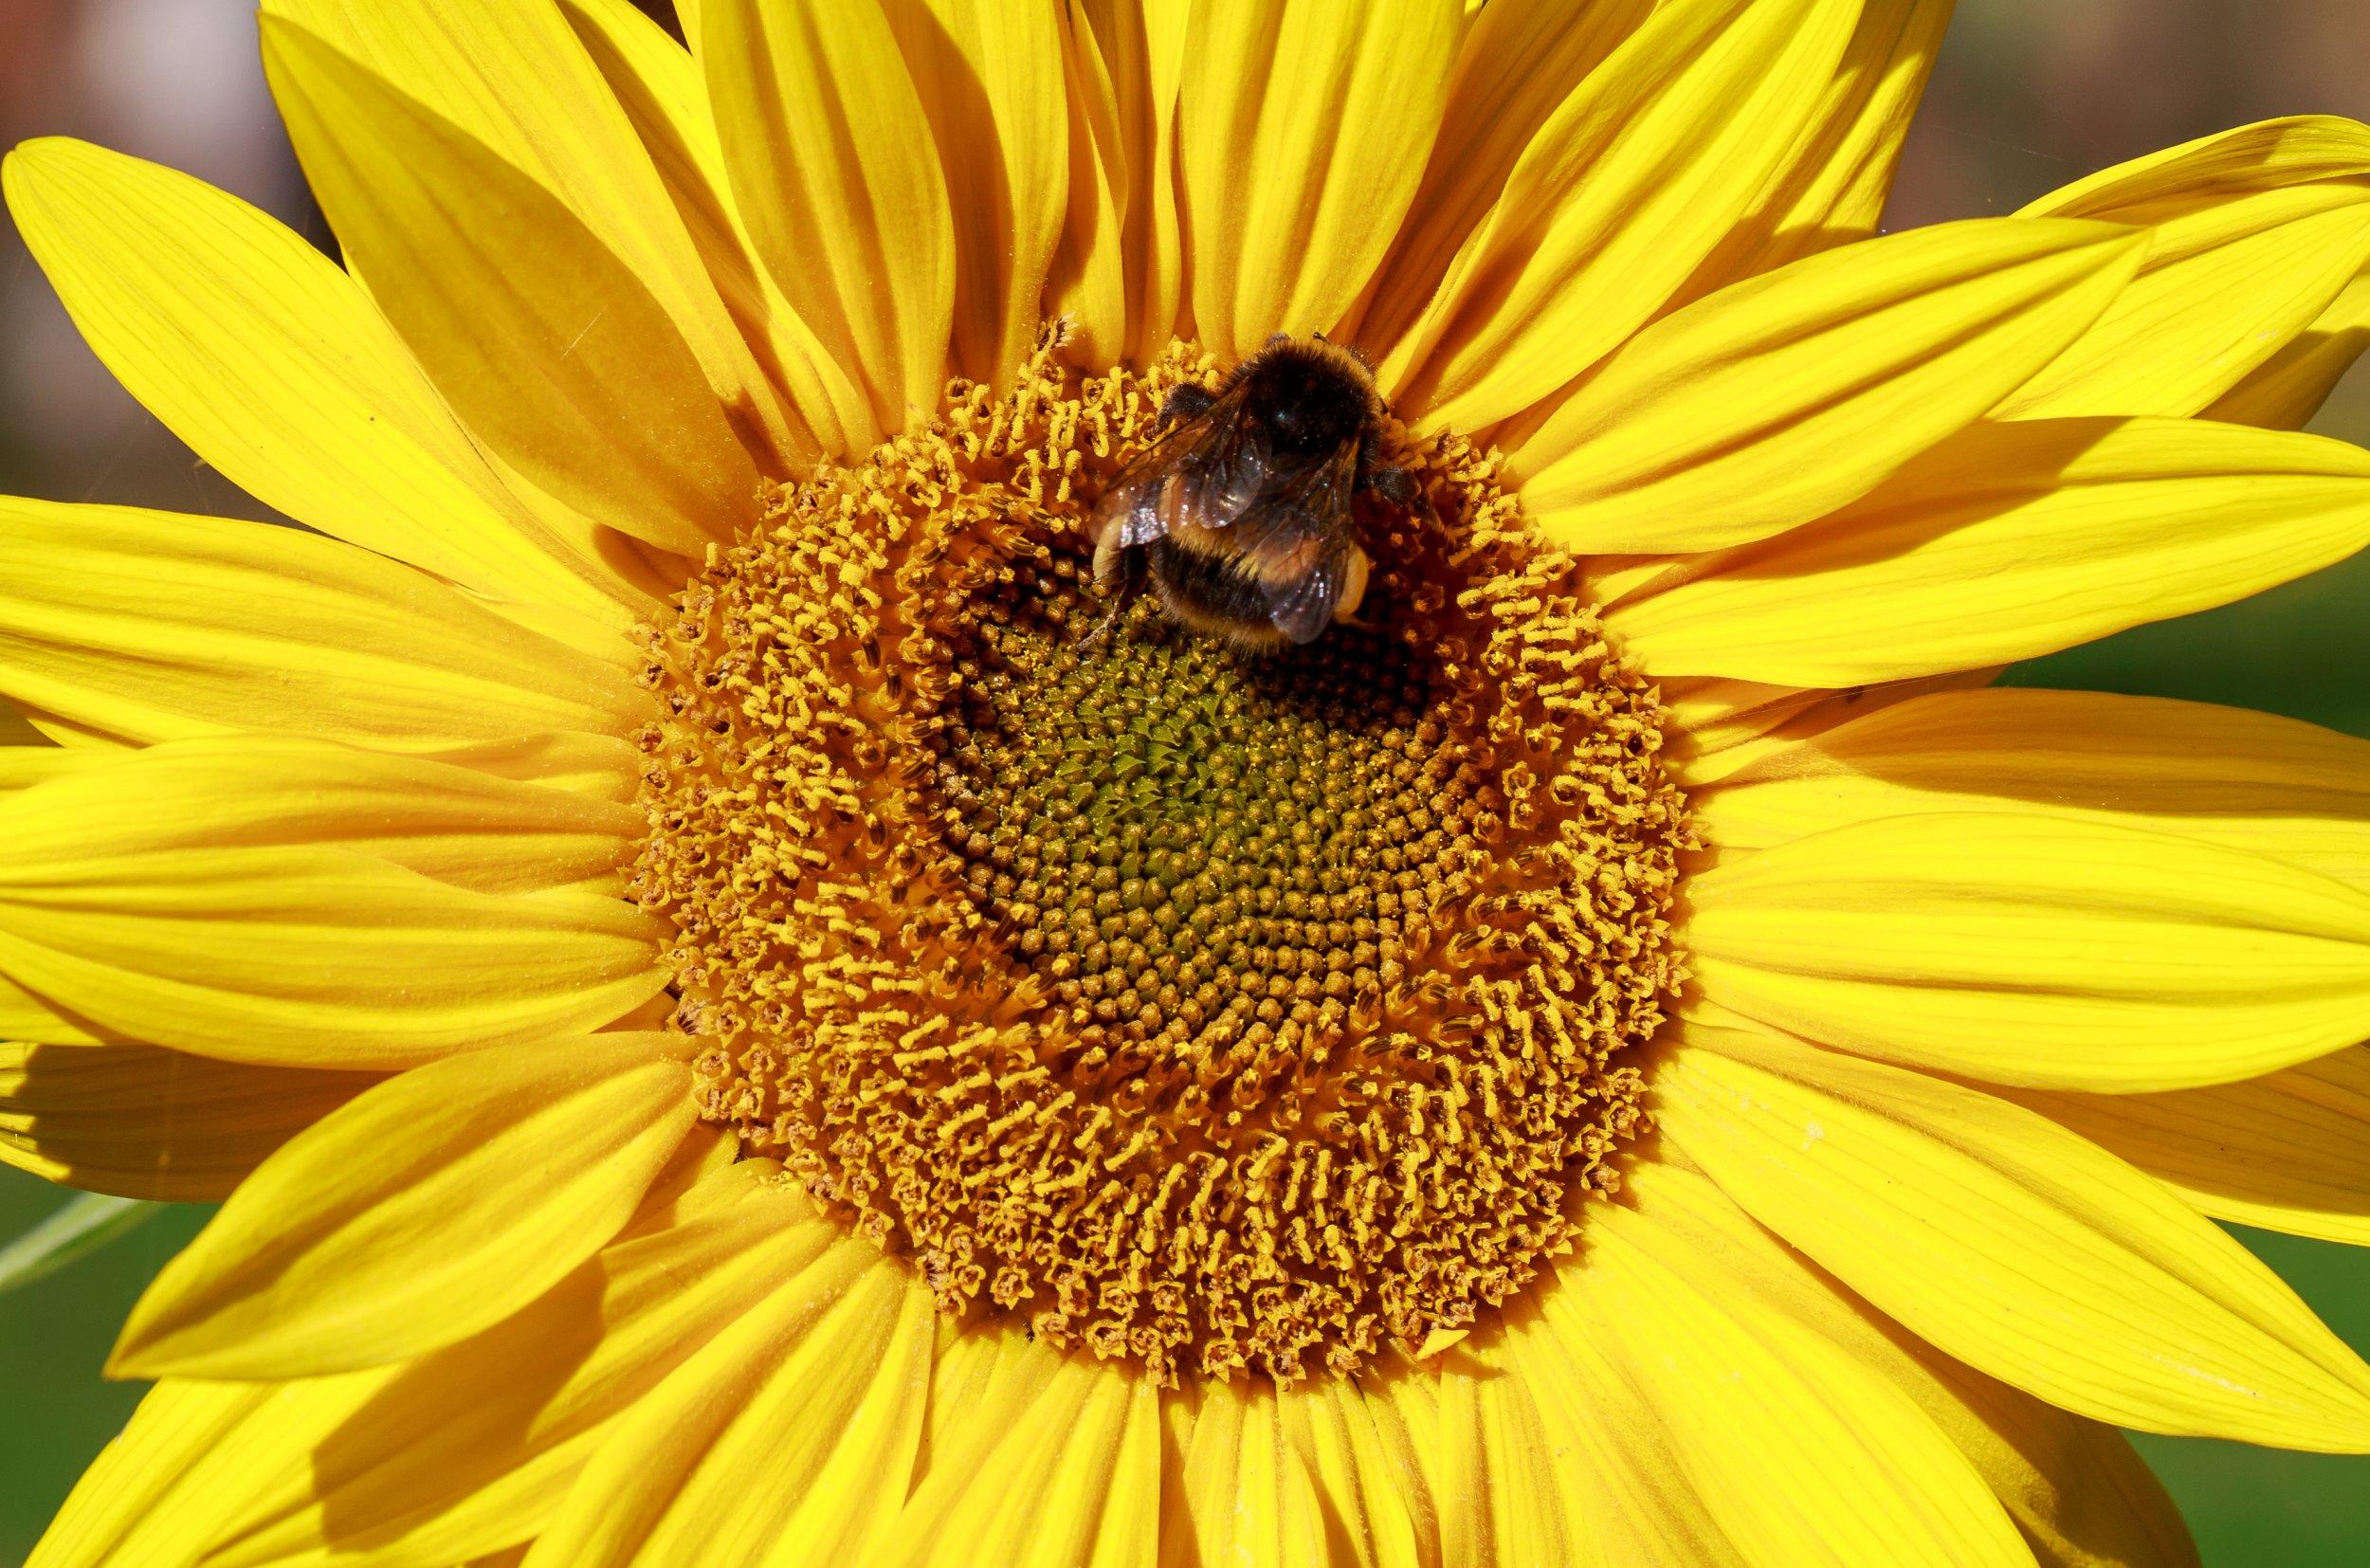 sunflowers-bee-stock